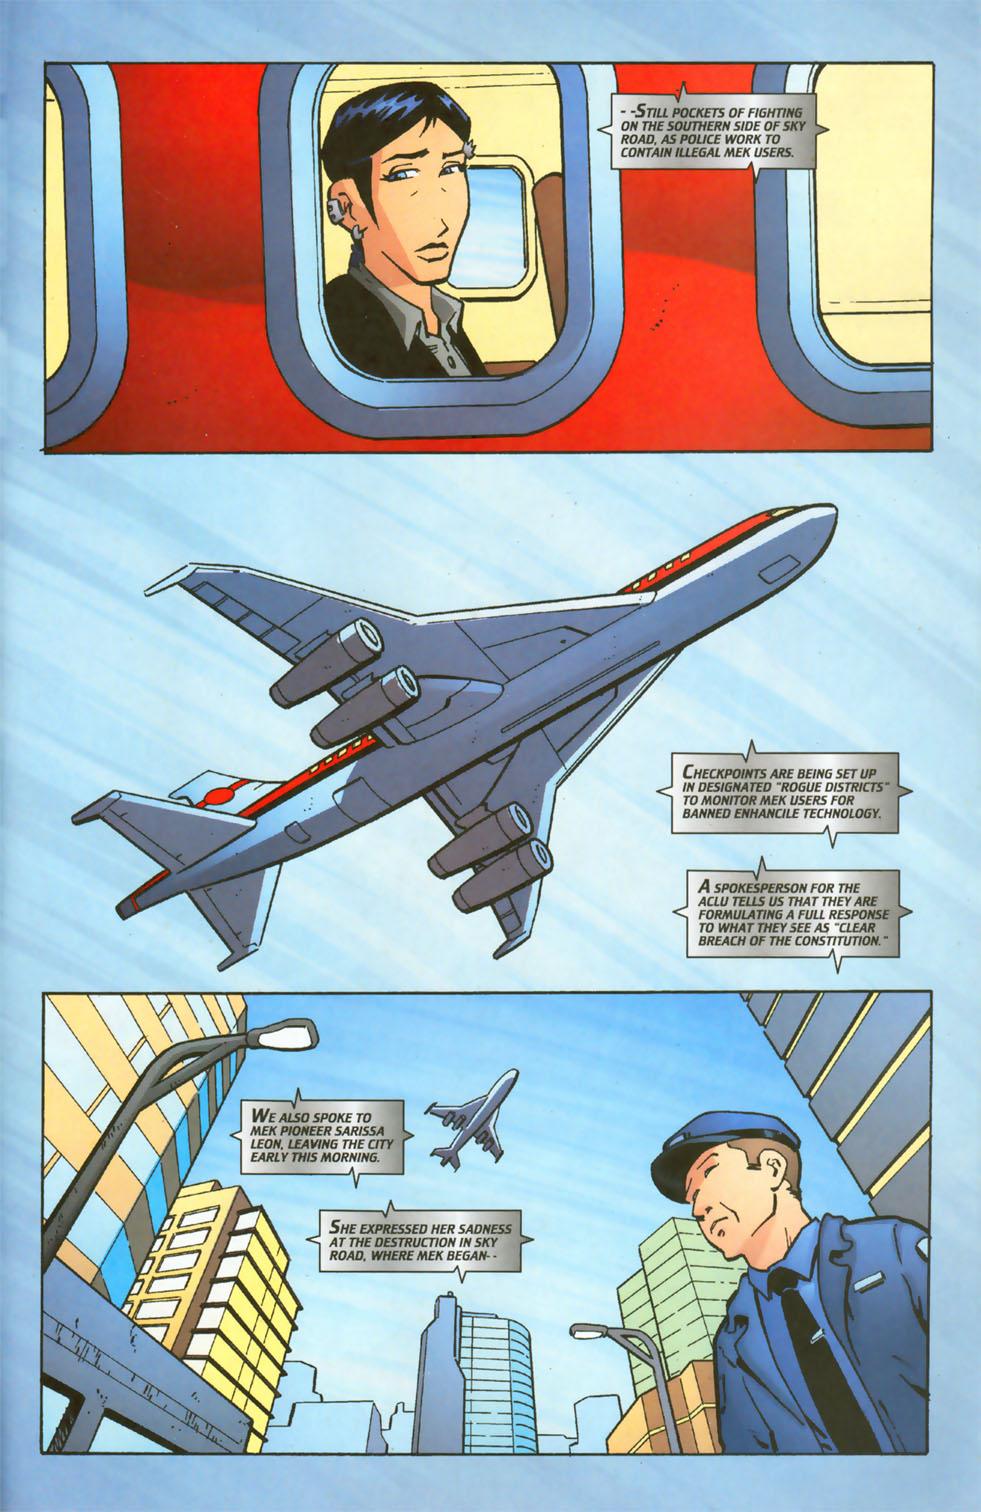 Read online Mek comic -  Issue #3 - 25